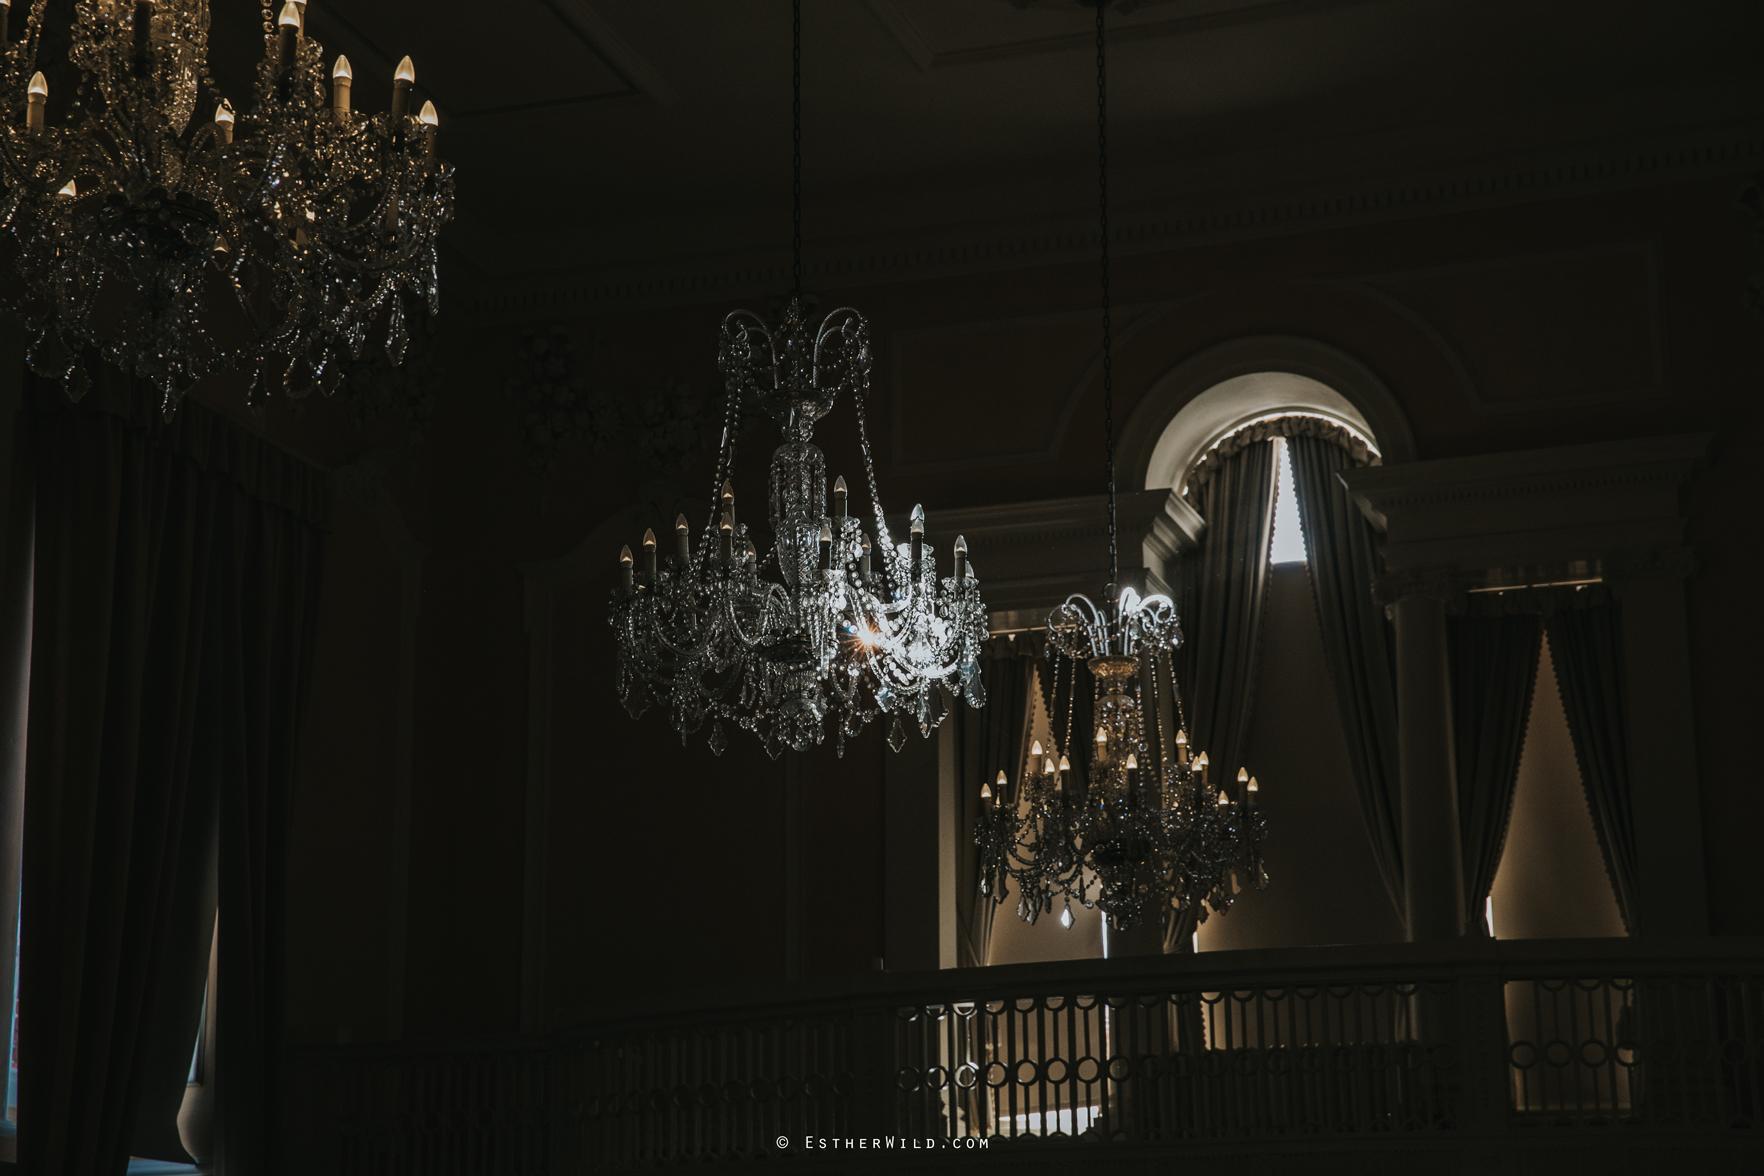 Norwich_Castle_Assembly_House_Norwich_Norfolk_Esther_Wild_Photographer_IMG_1558.jpg